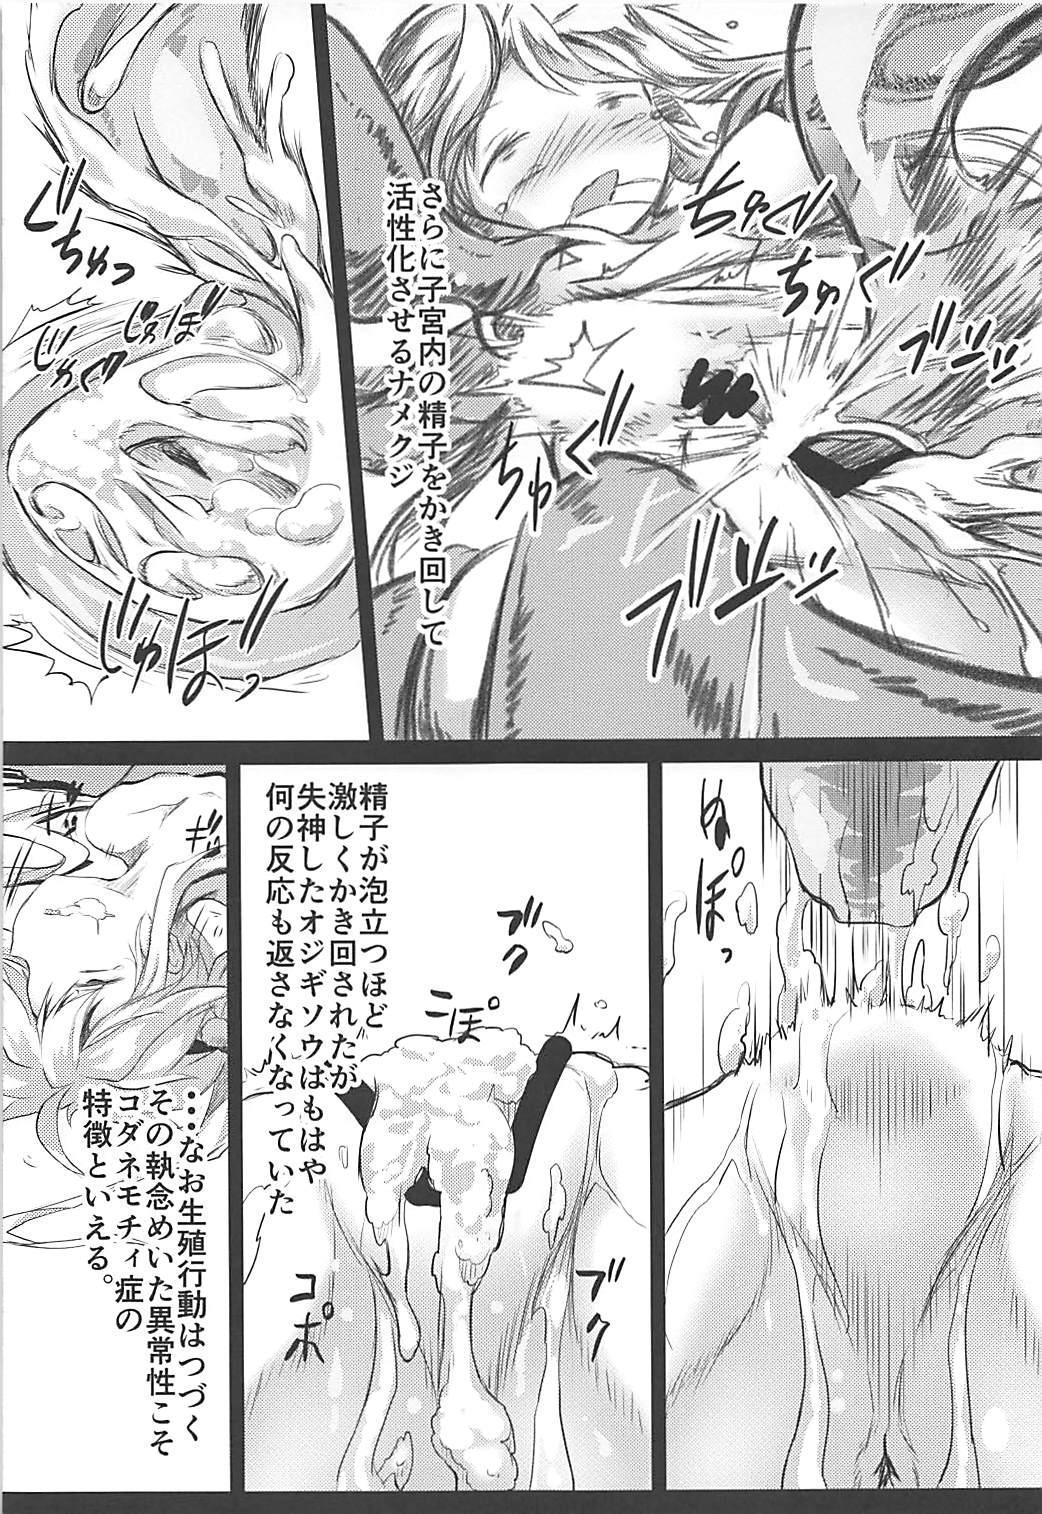 Gaichuu Higai Houkokusho 9